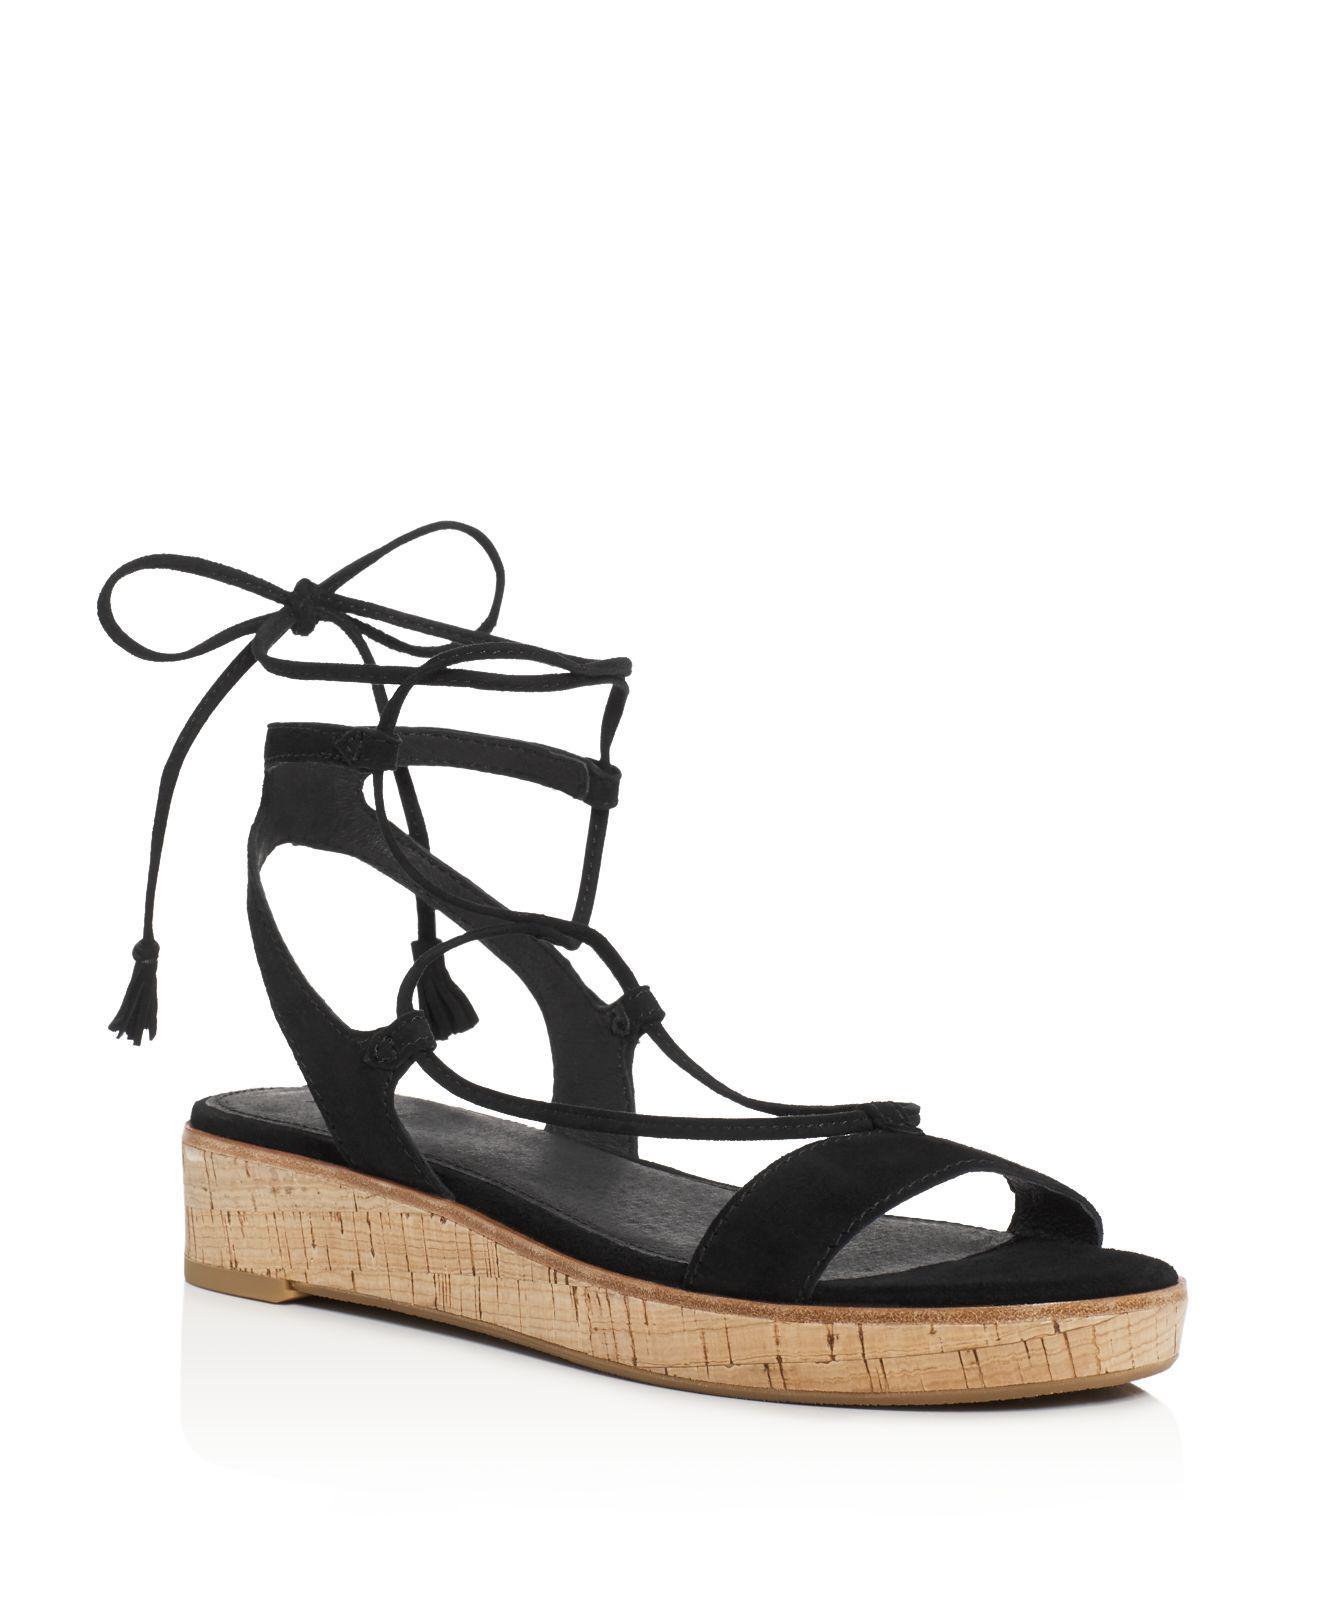 Frye Miranda Leather Gladiator Wedge Sandals xP3rLP5